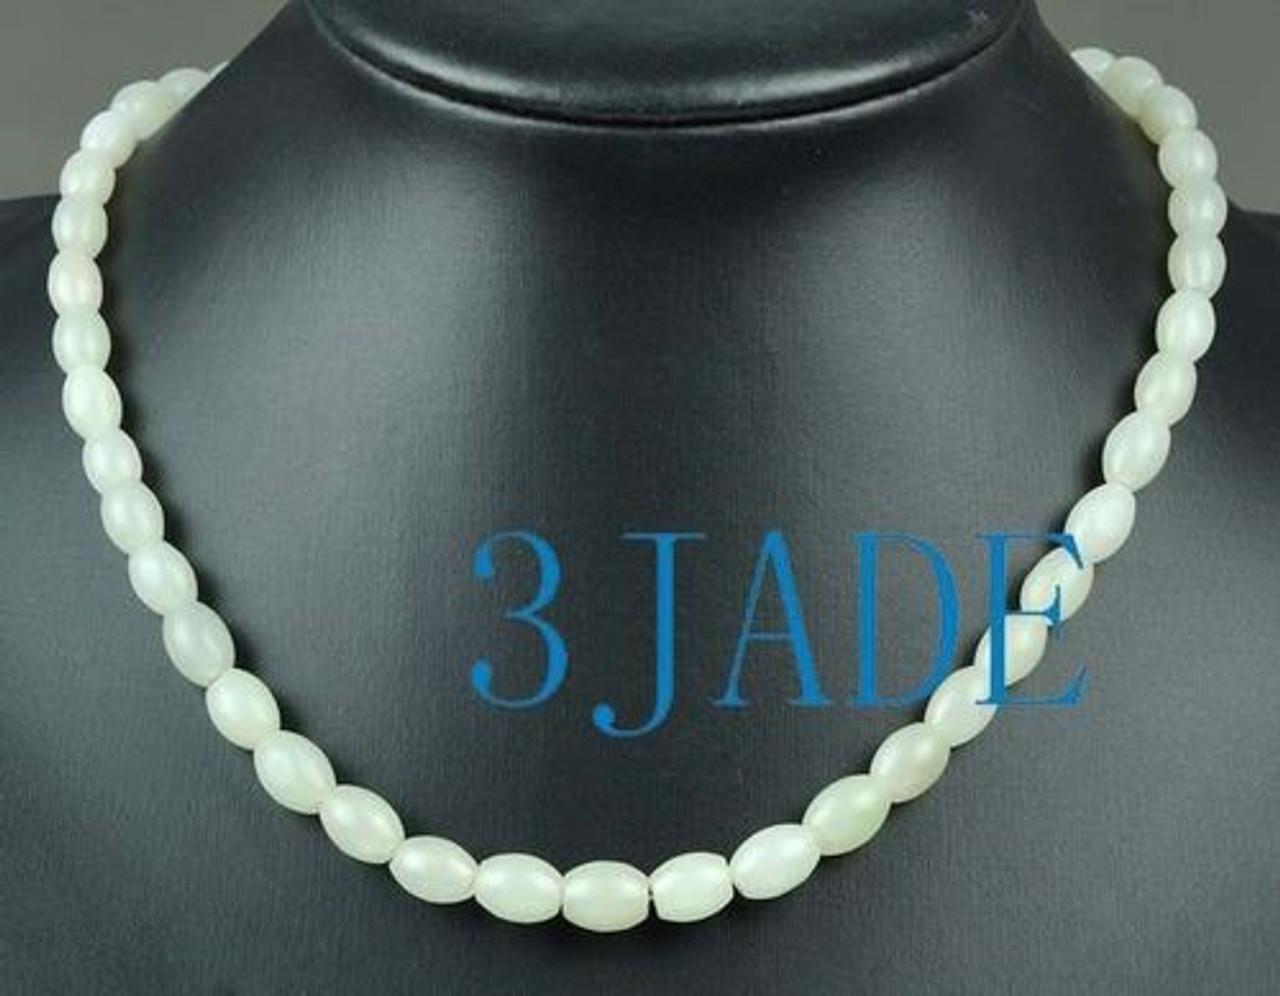 Natural Hetian Nephrite Jade Beads Necklace, w/ certificate